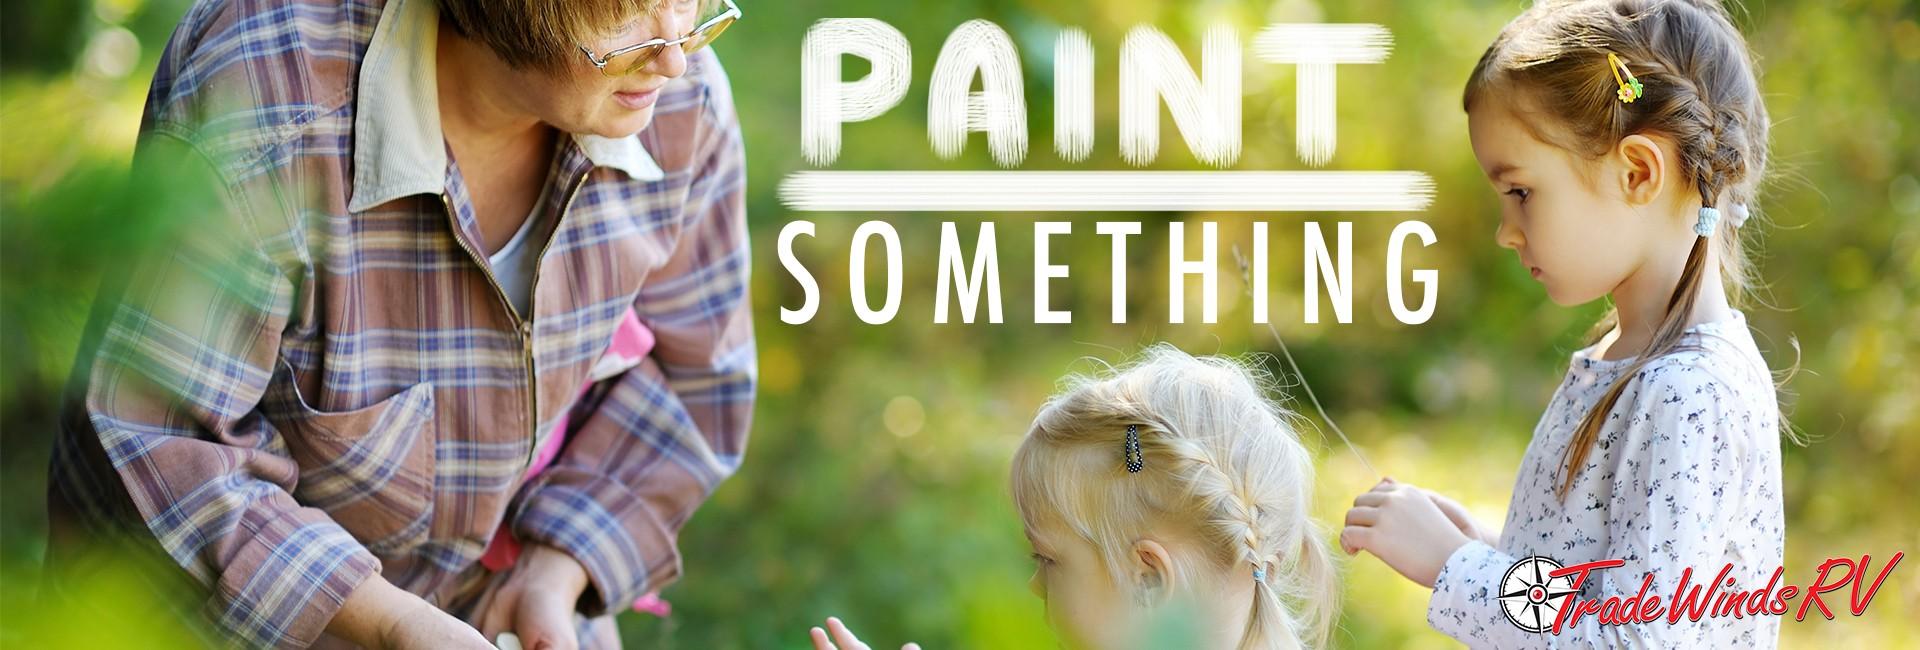 paint-something